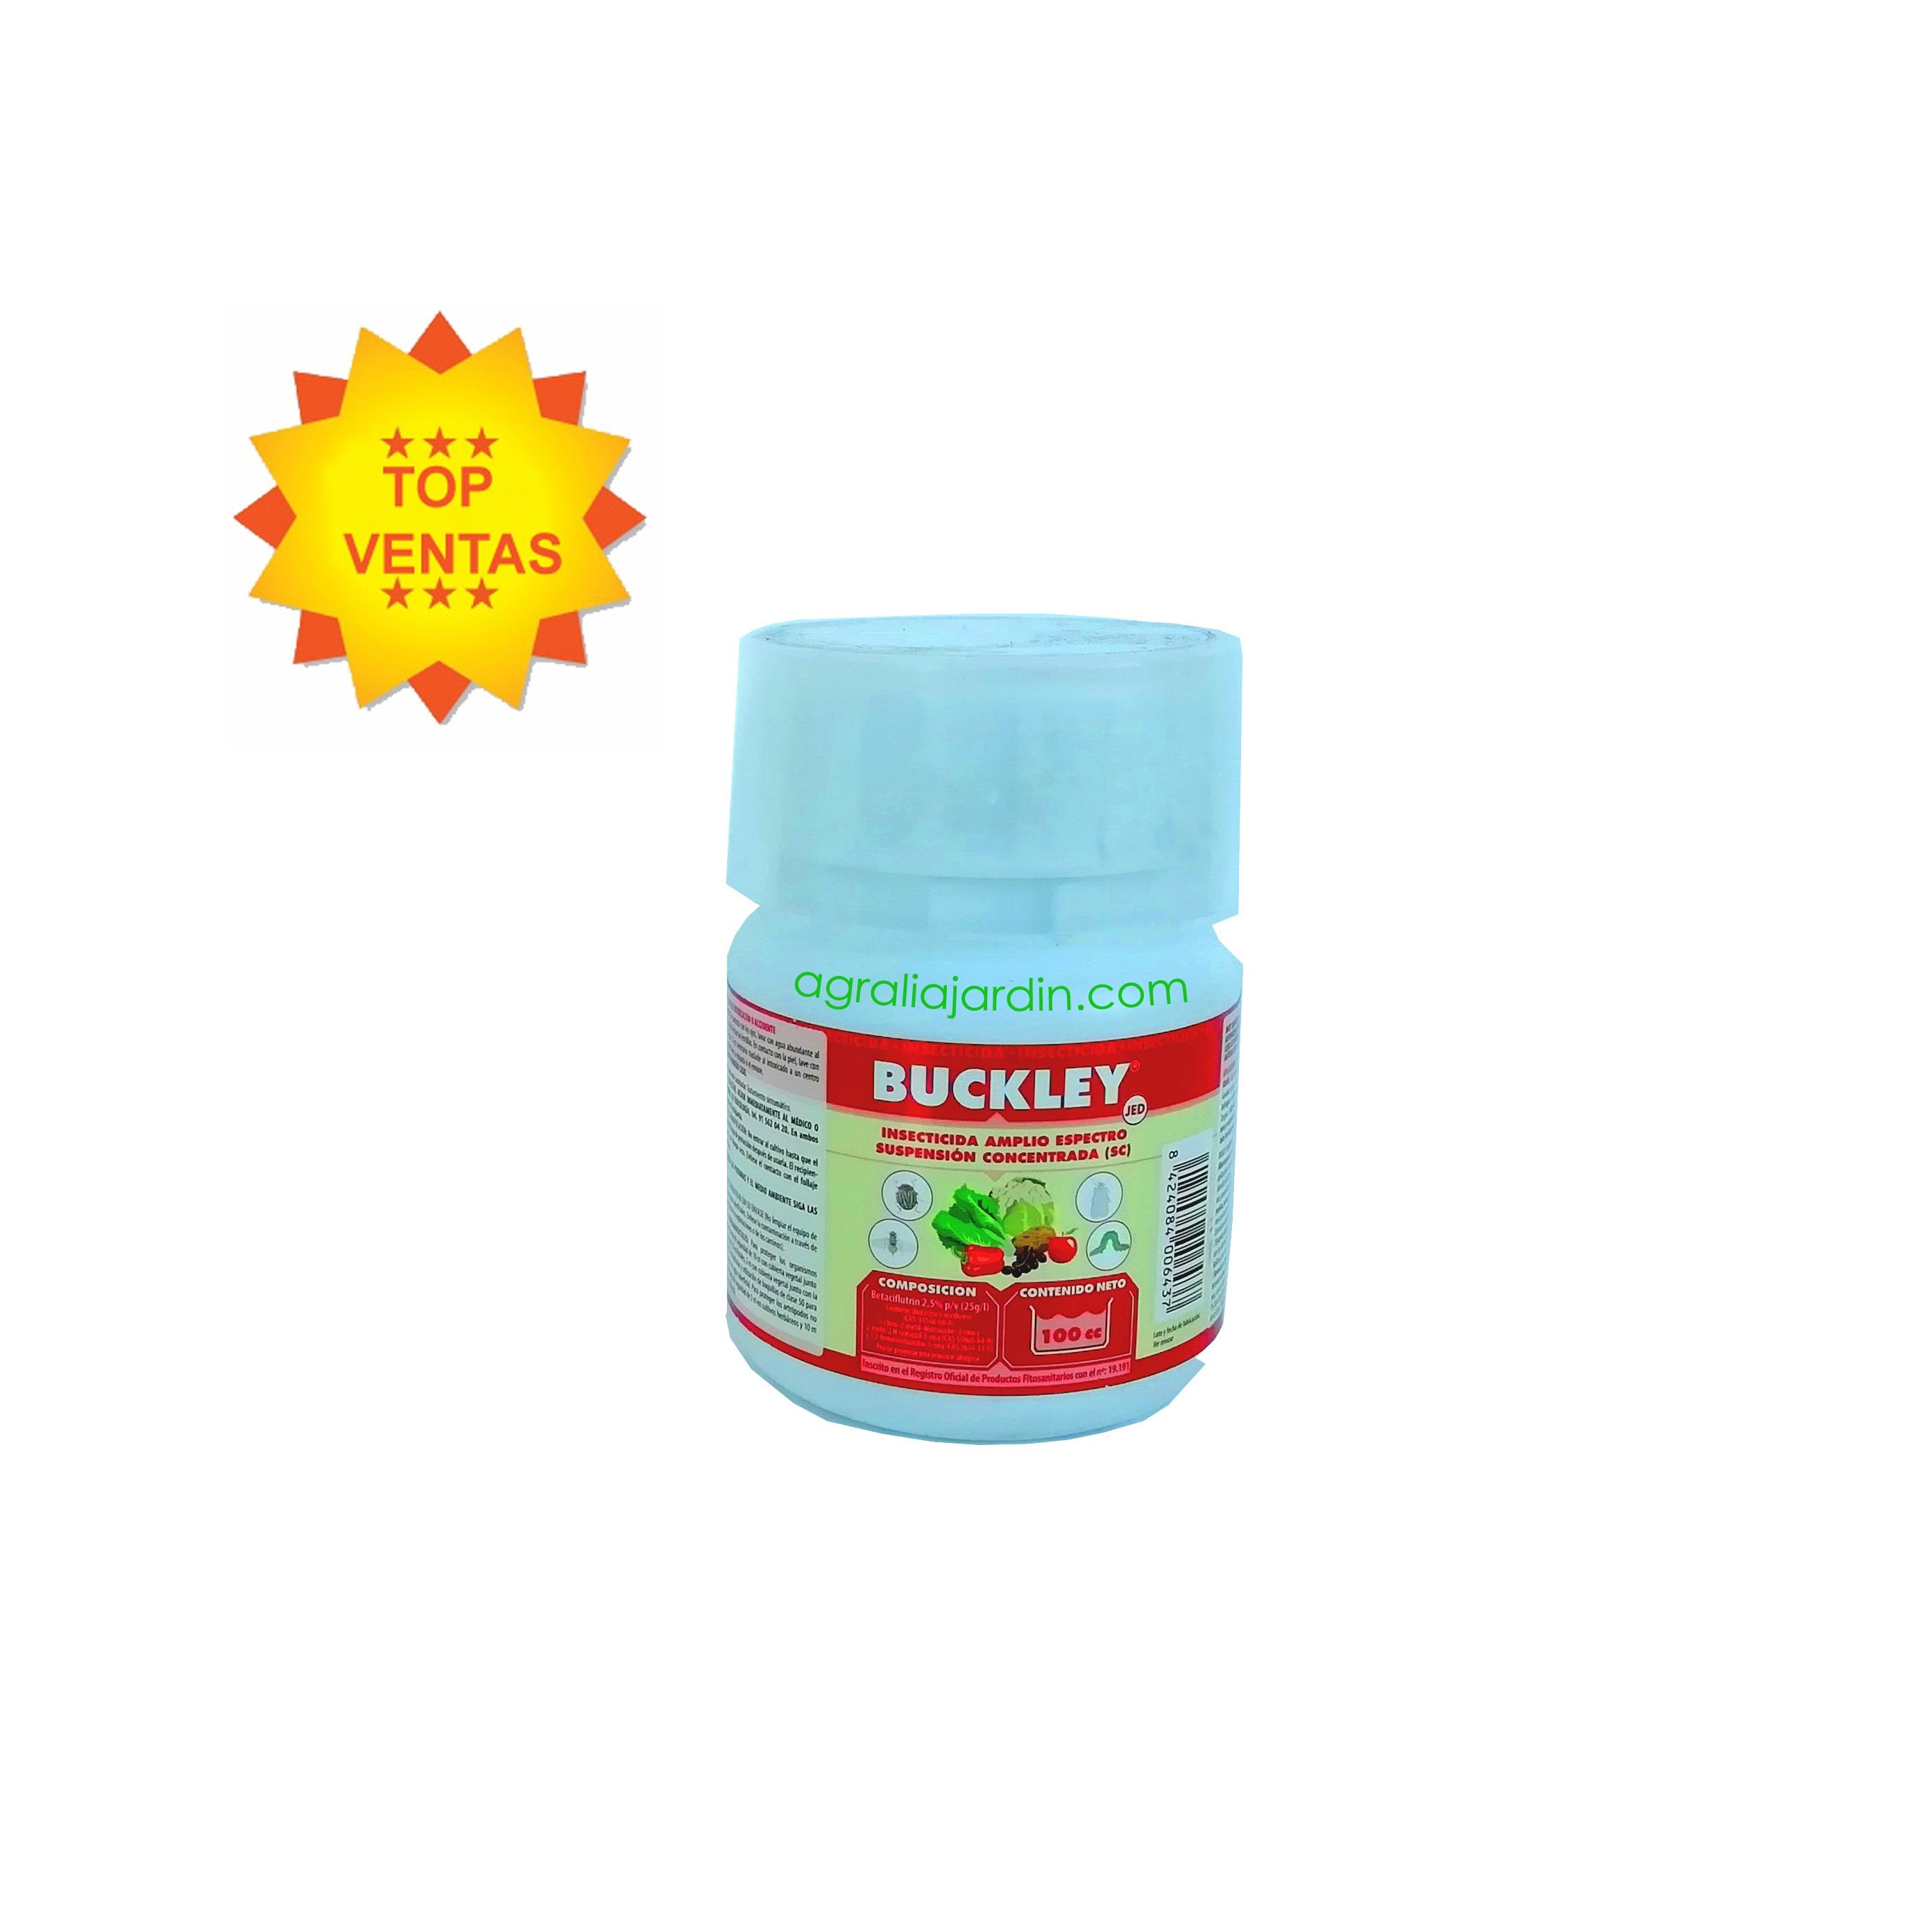 Buckley insecticida agraliajardin